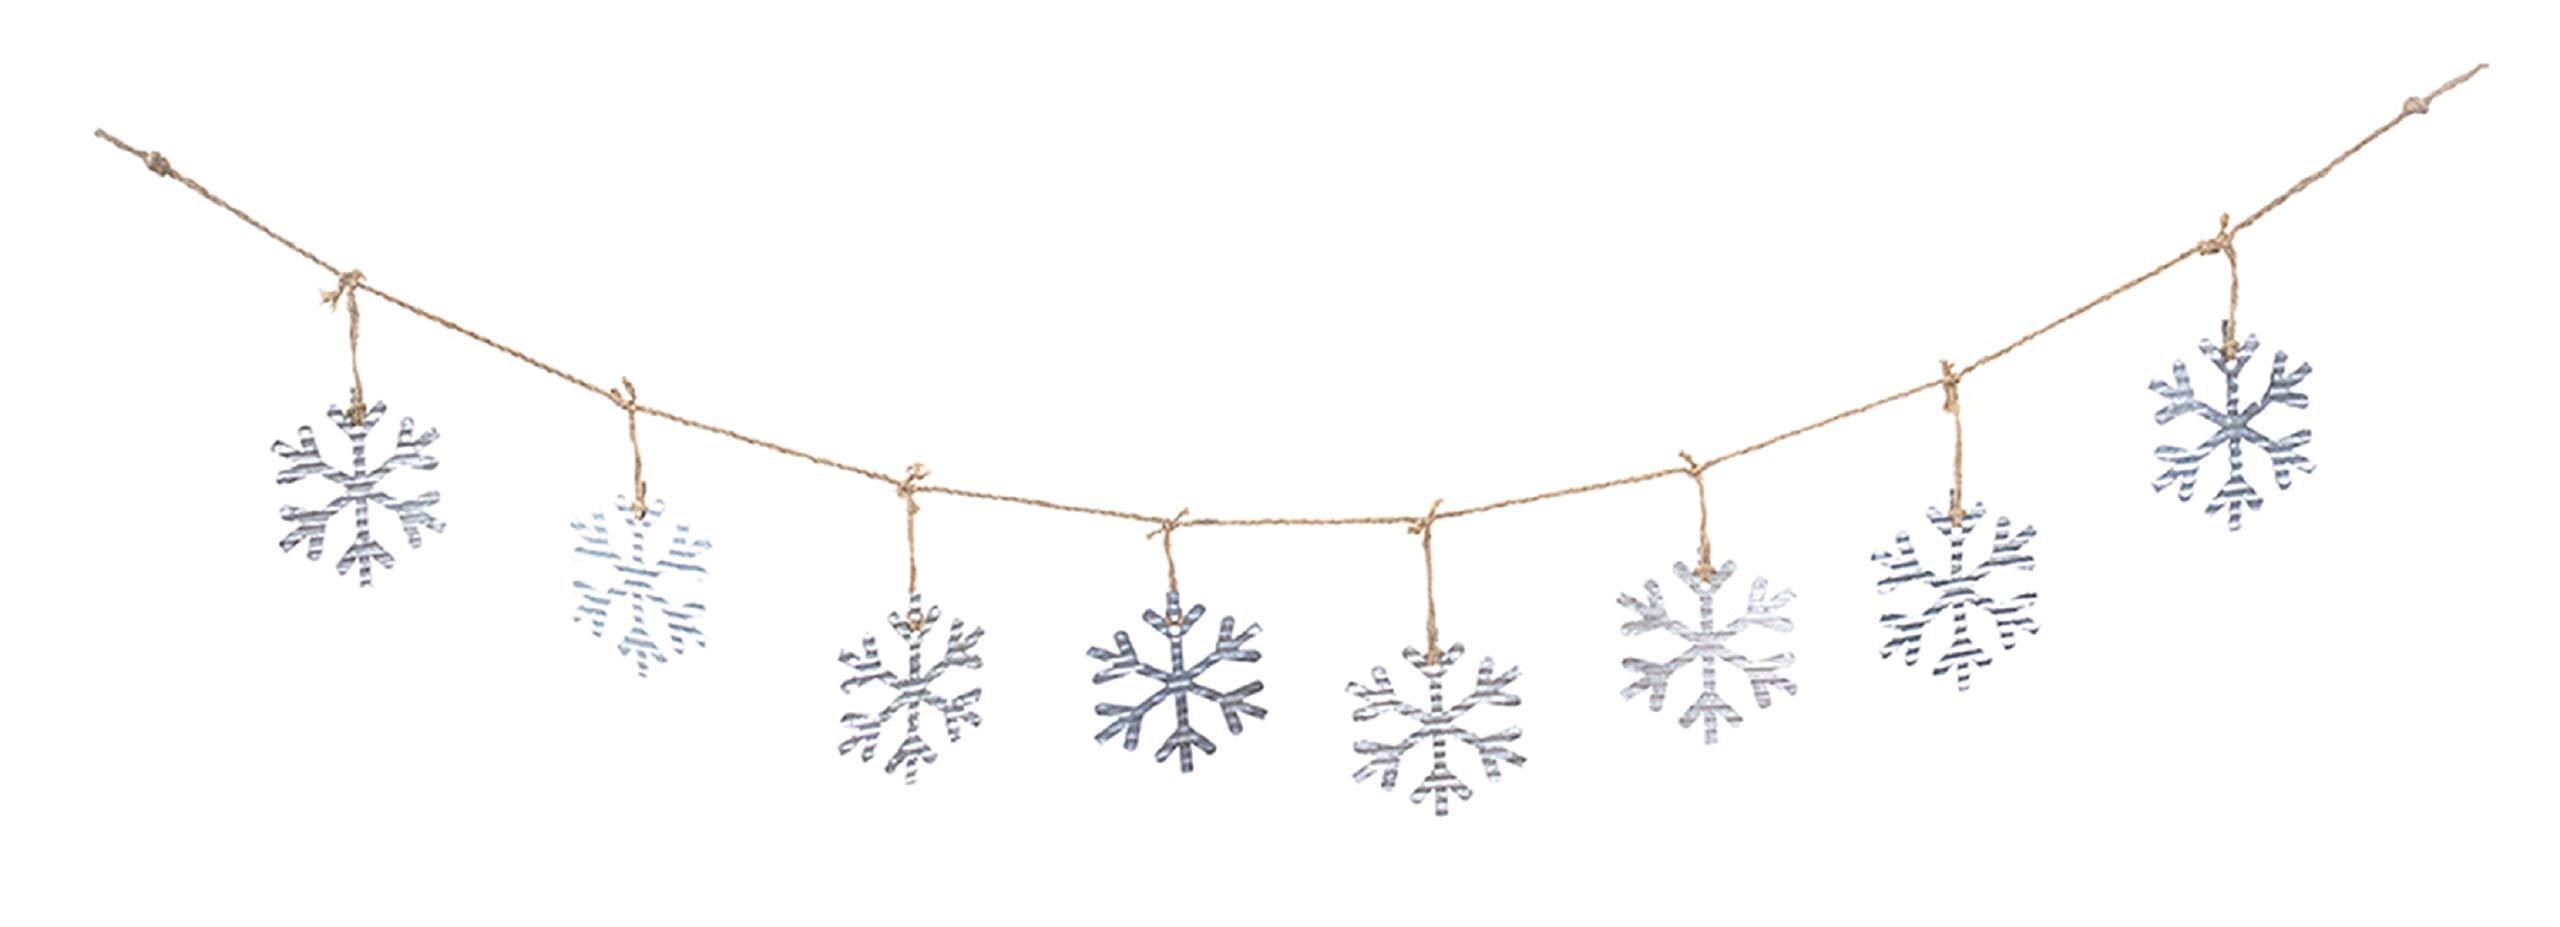 Melrose 5.75' Galvanized Snowflakes on Jute Rope Christmas Garland